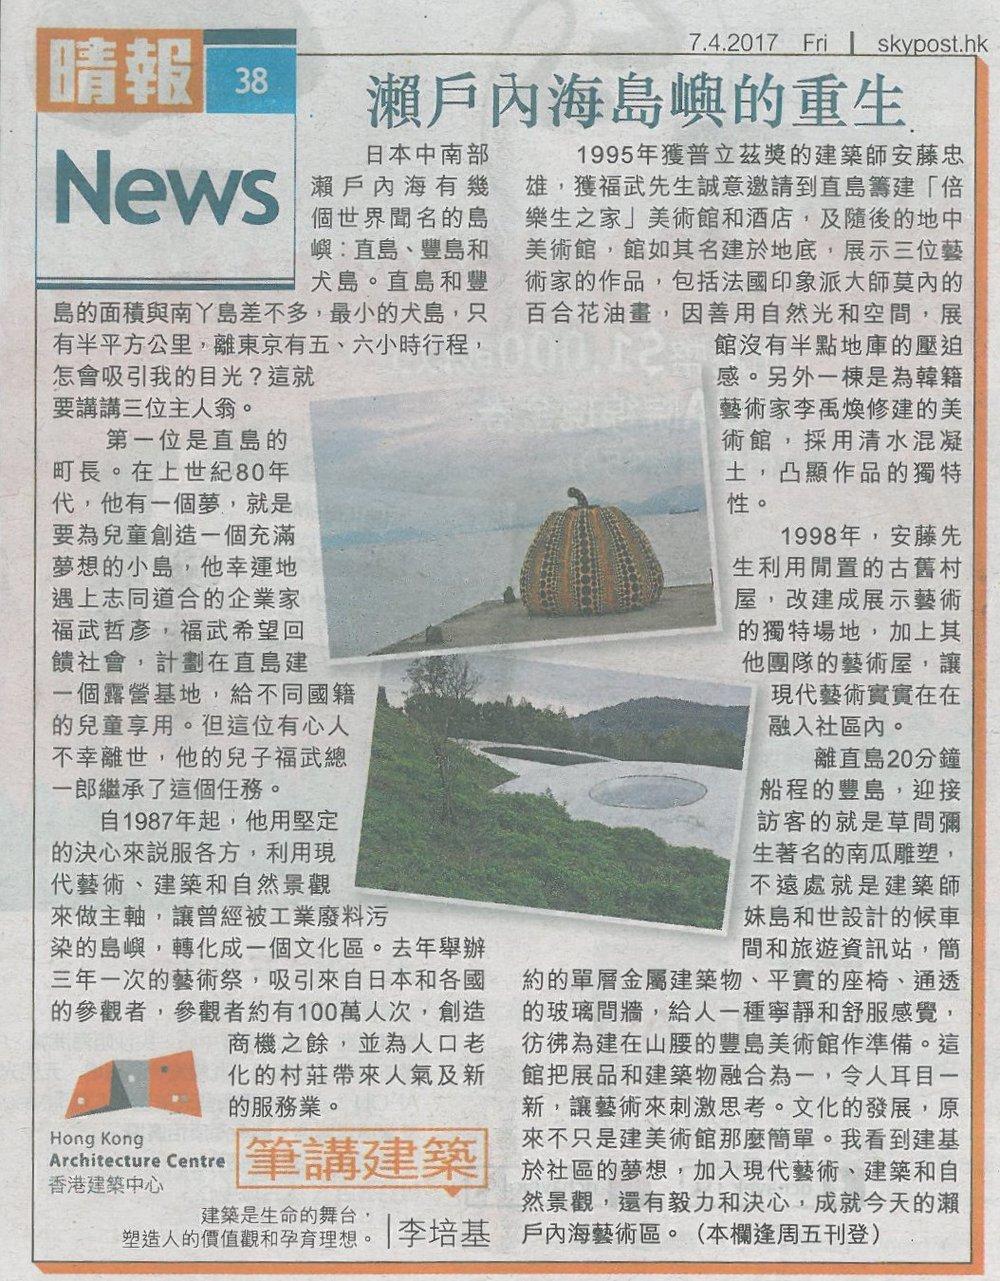 Skypost_170407__李培基_瀨戶內海島嶼的重生.jpg